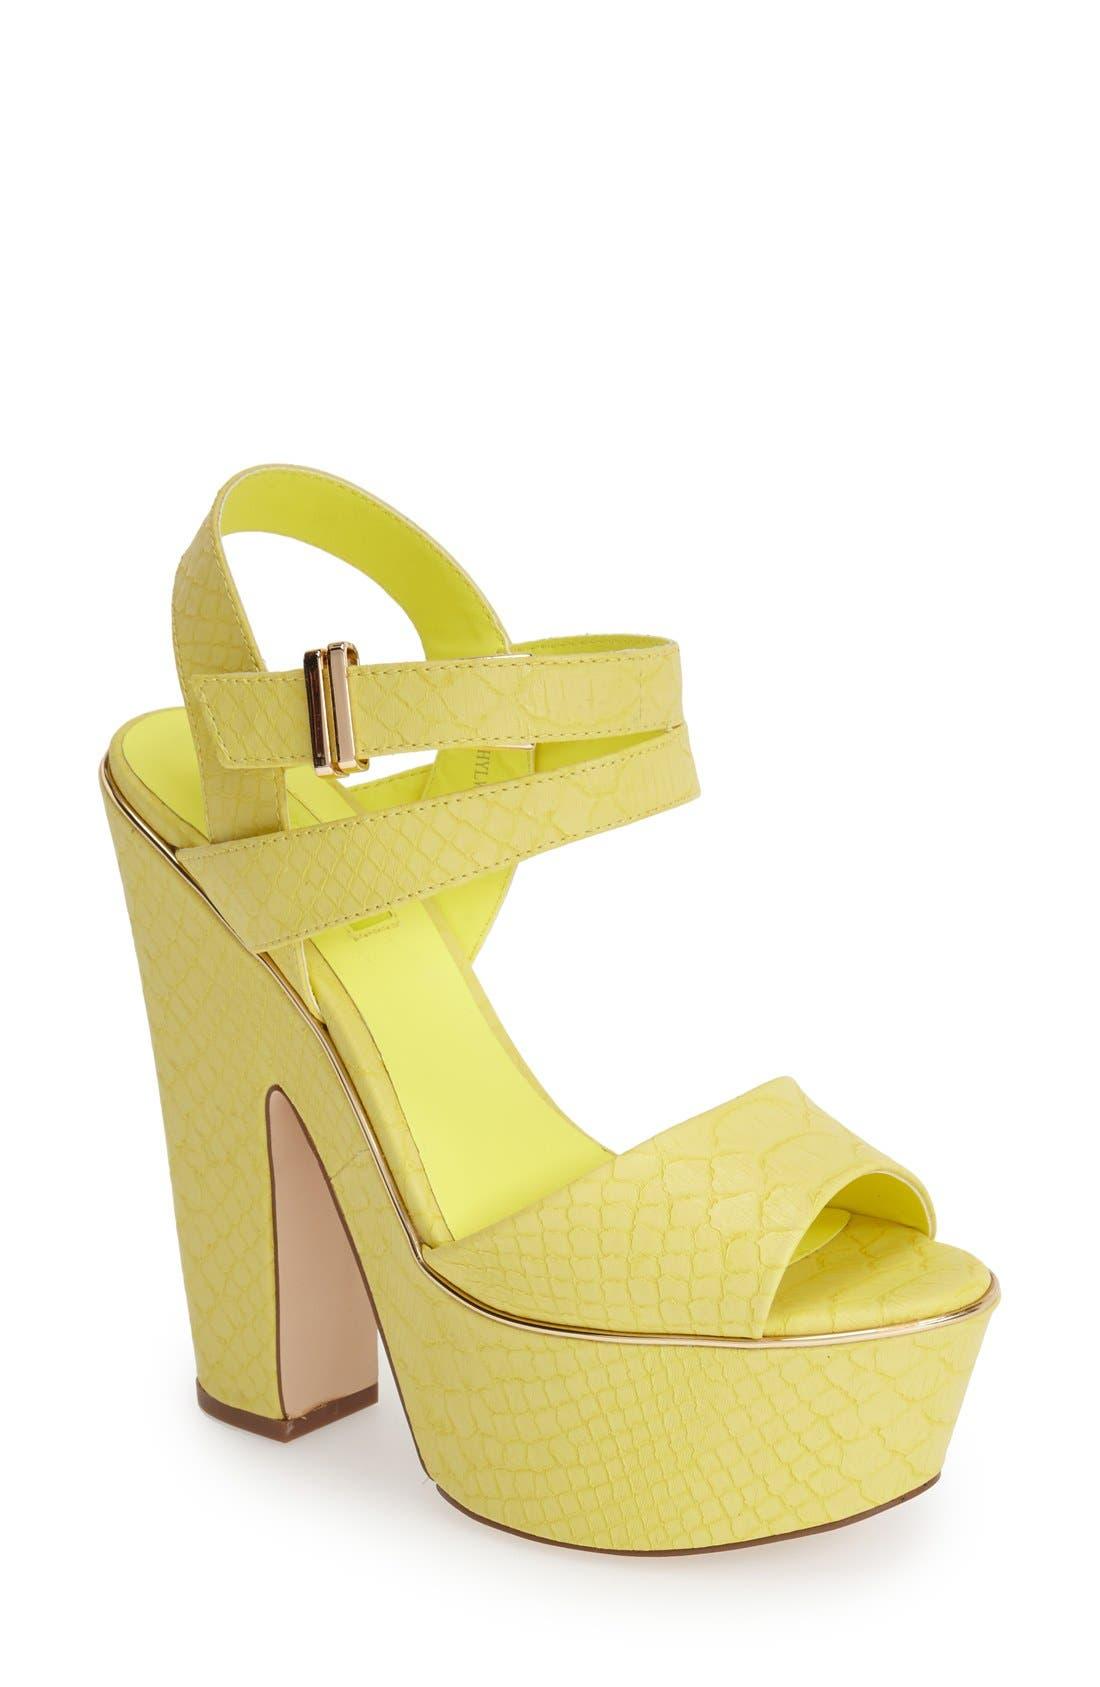 Alternate Image 1 Selected - Topshop 'Lenni2' Platform Sandal (Women)